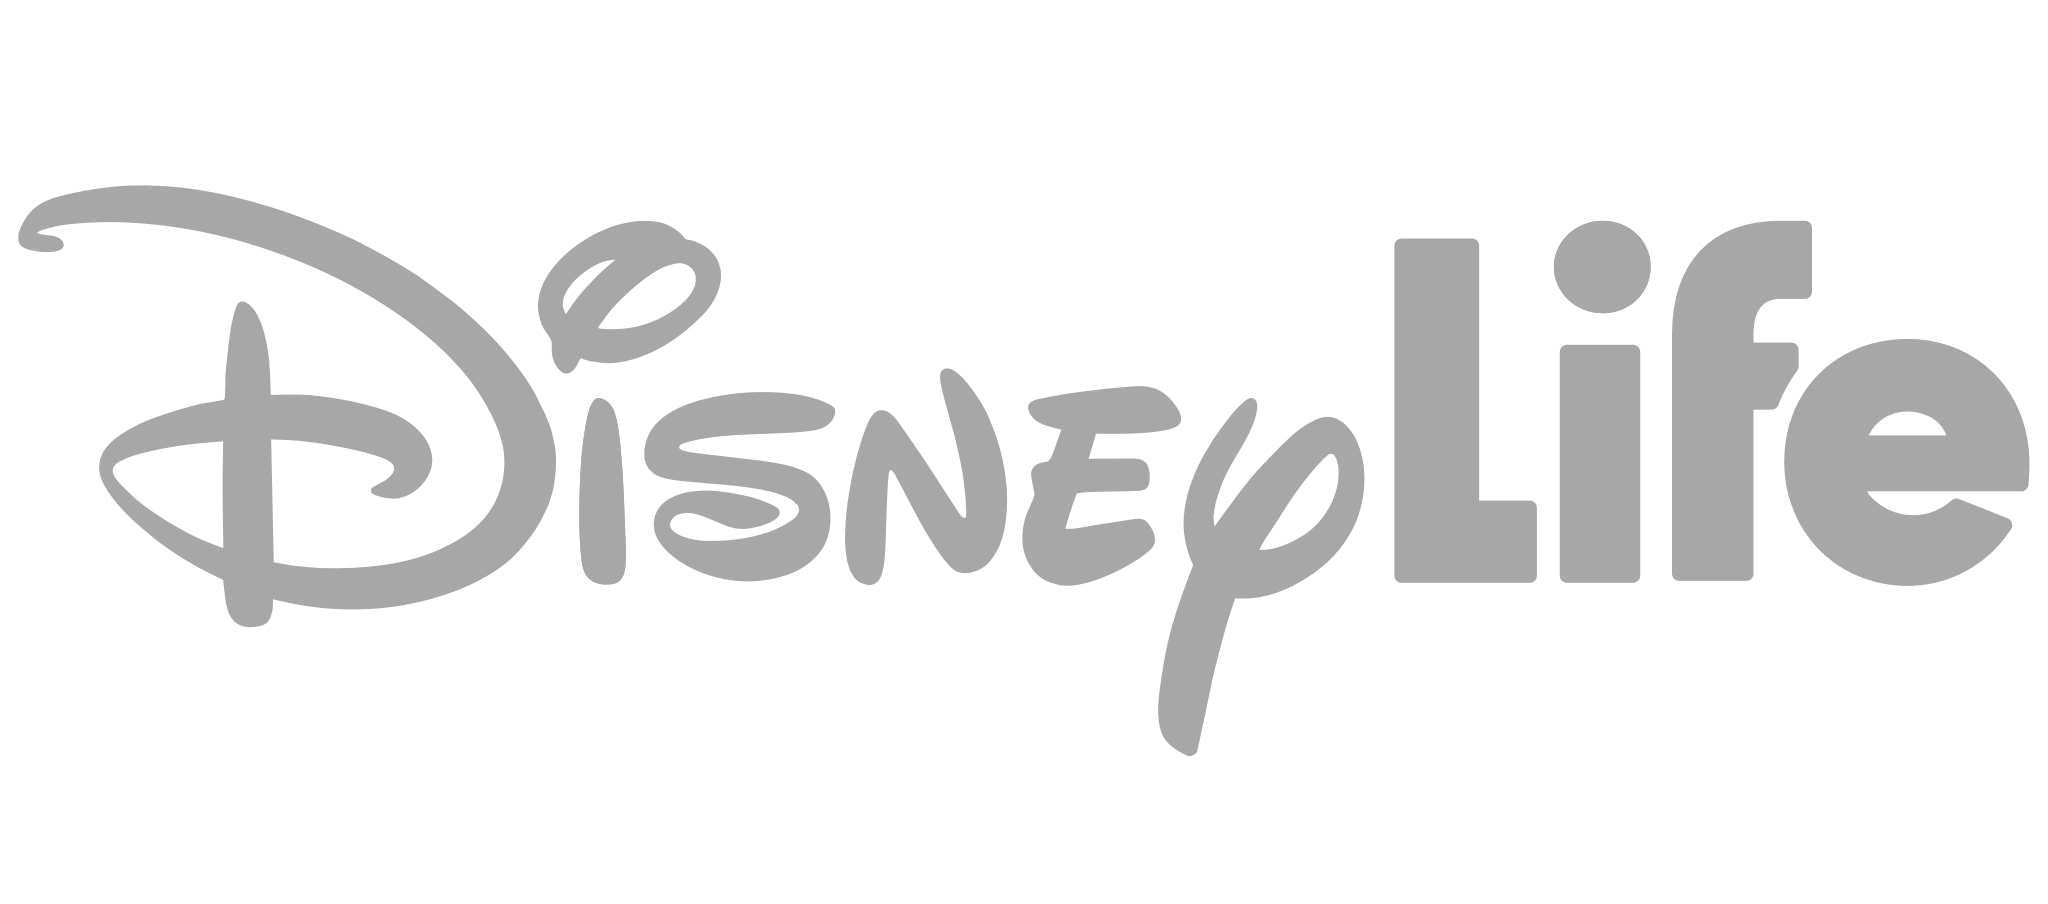 Life Font Disneylife Watch Disney Movies Tv Box Sets Listen To Music